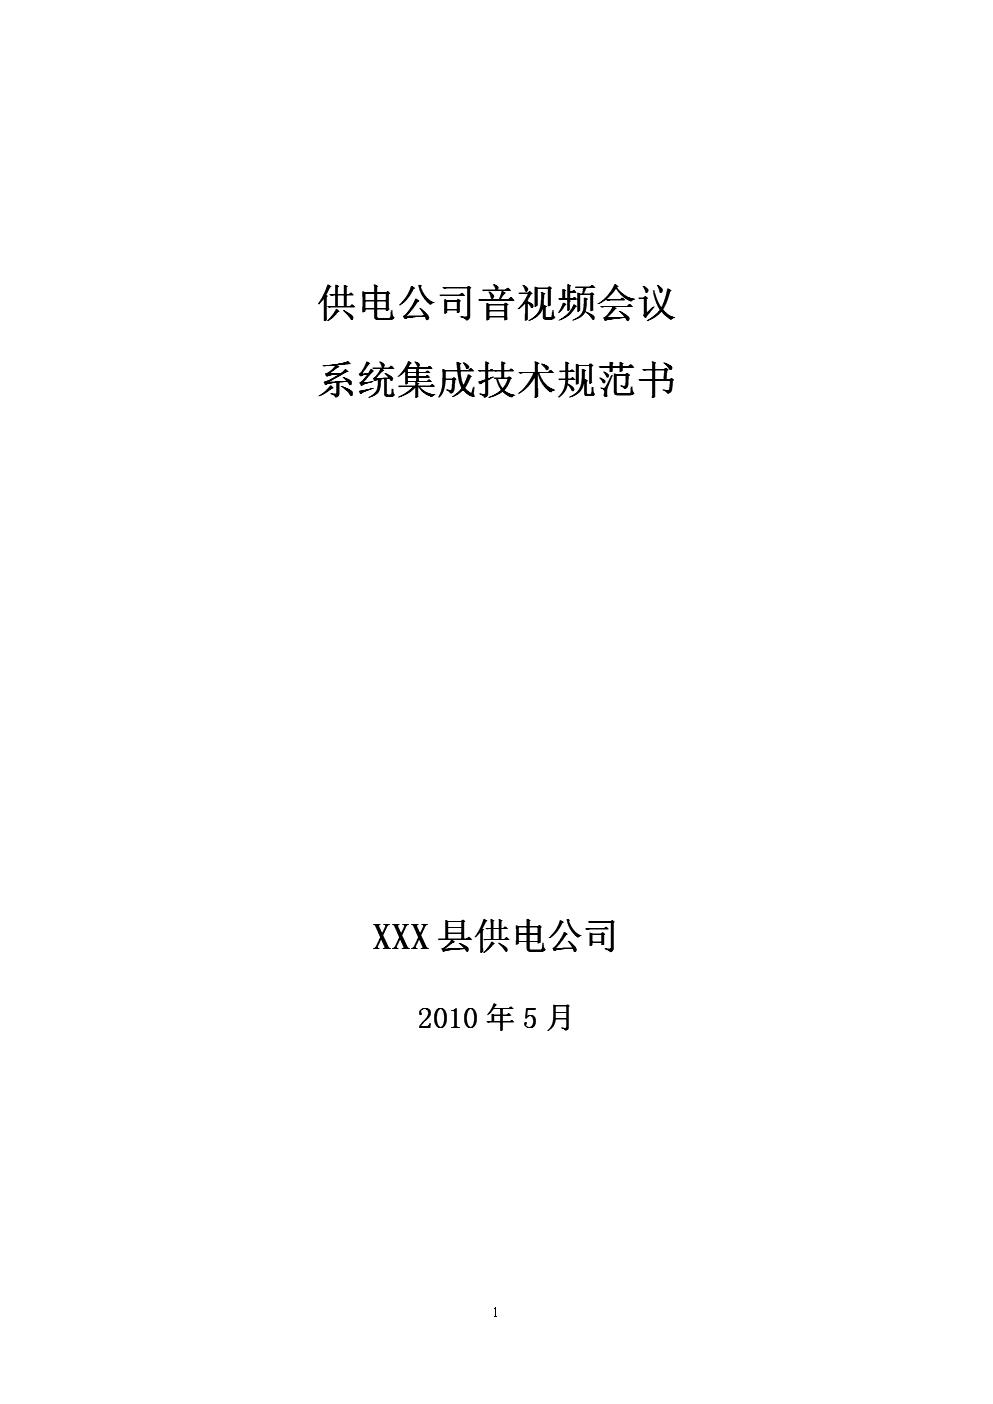 v视频音视频议系统集成技术规范书(新1).do视频酒吧十堰图片